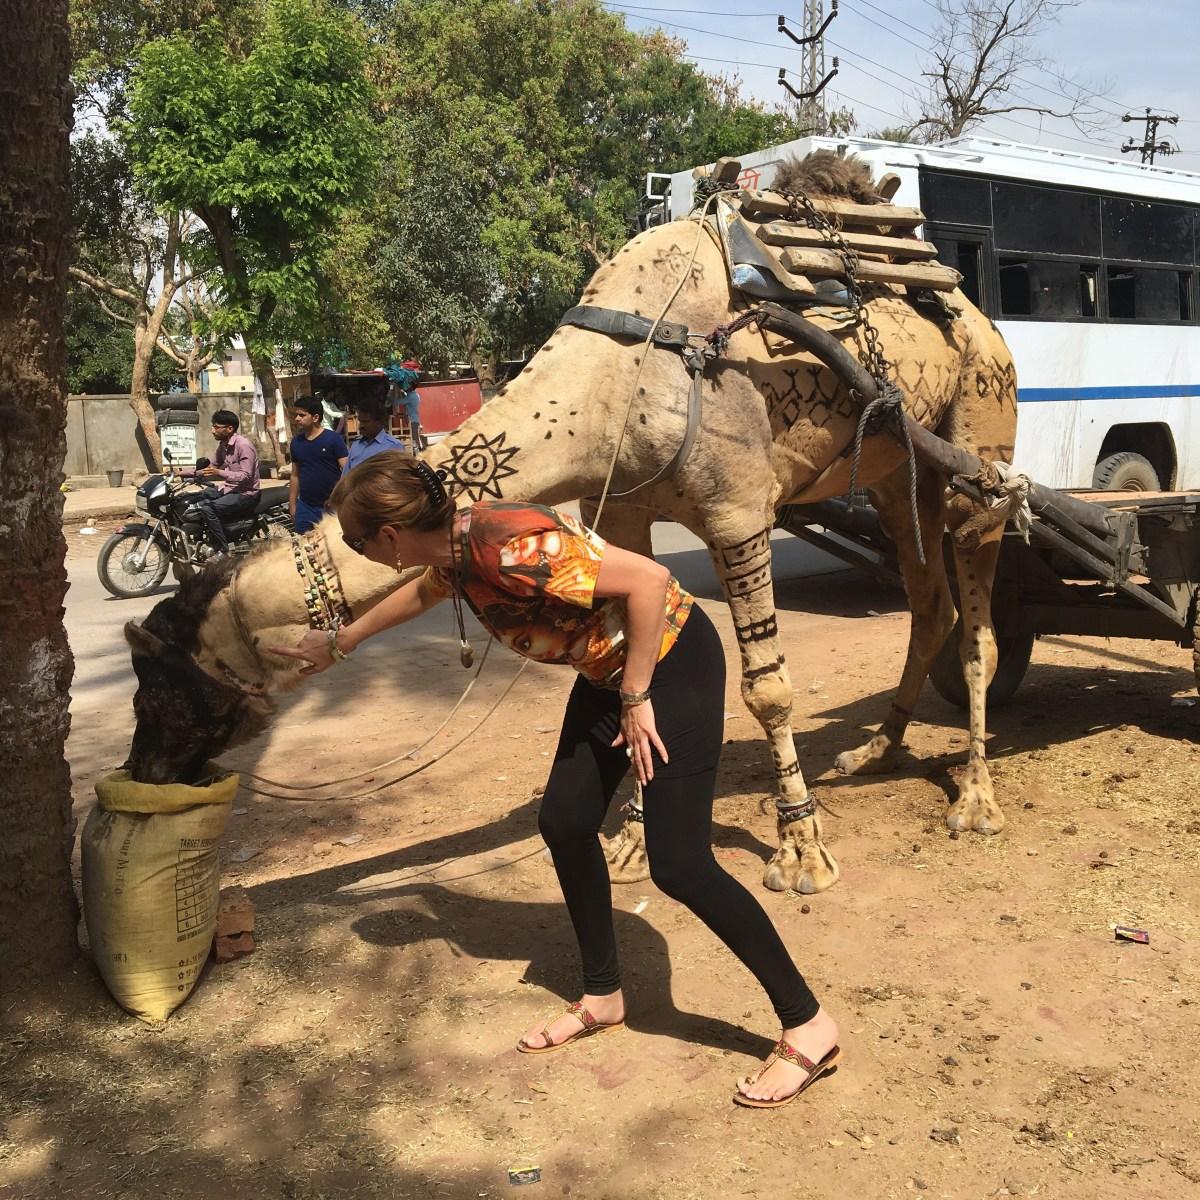 Me petting a camel